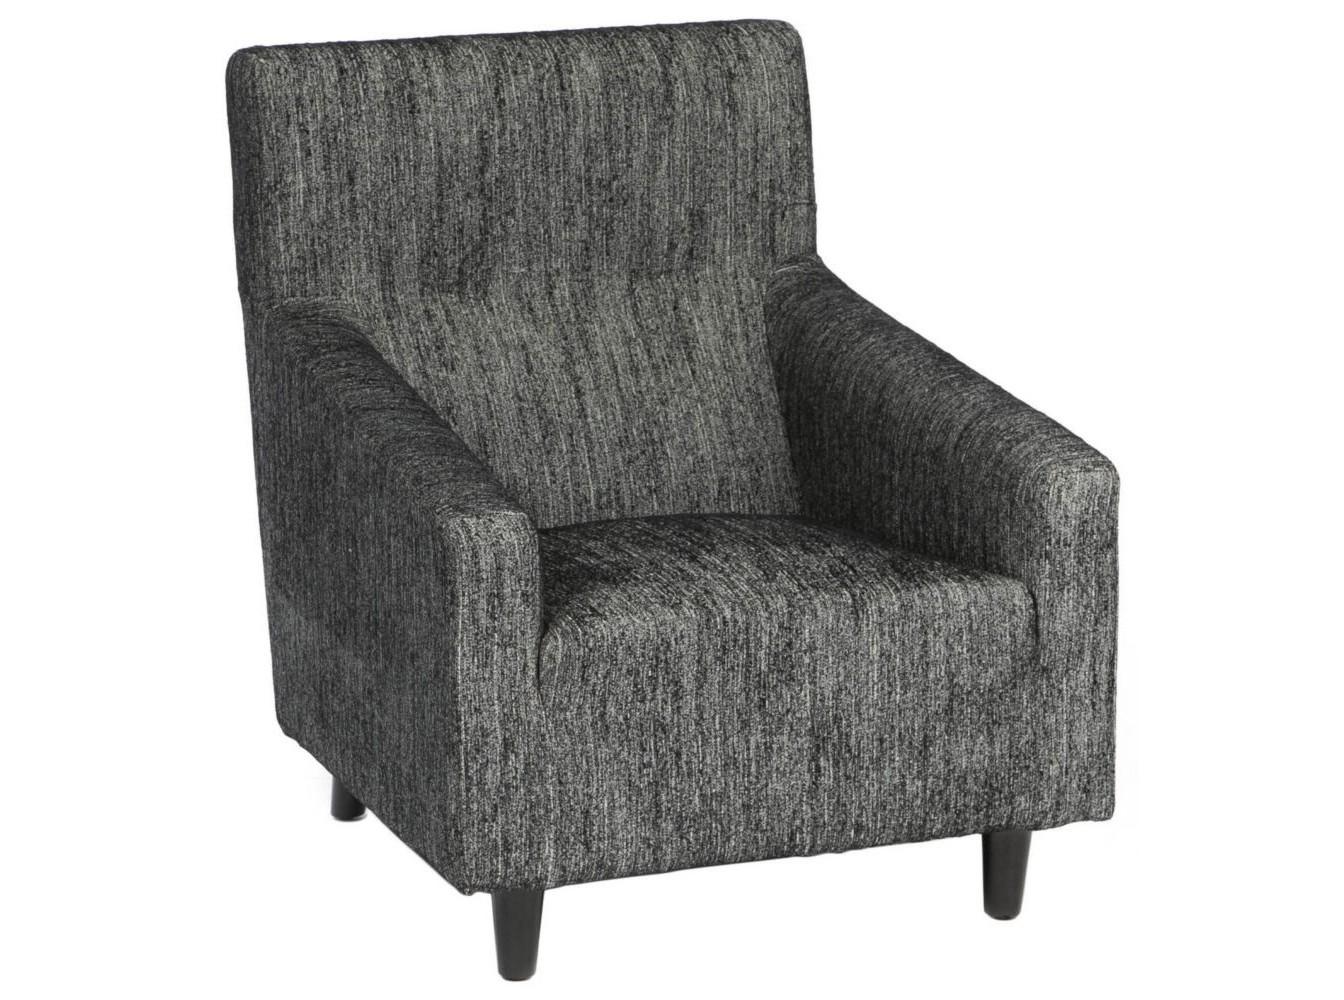 КреслоИнтерьерные кресла<br><br><br>Material: Текстиль<br>Width см: 89<br>Depth см: 77<br>Height см: 92